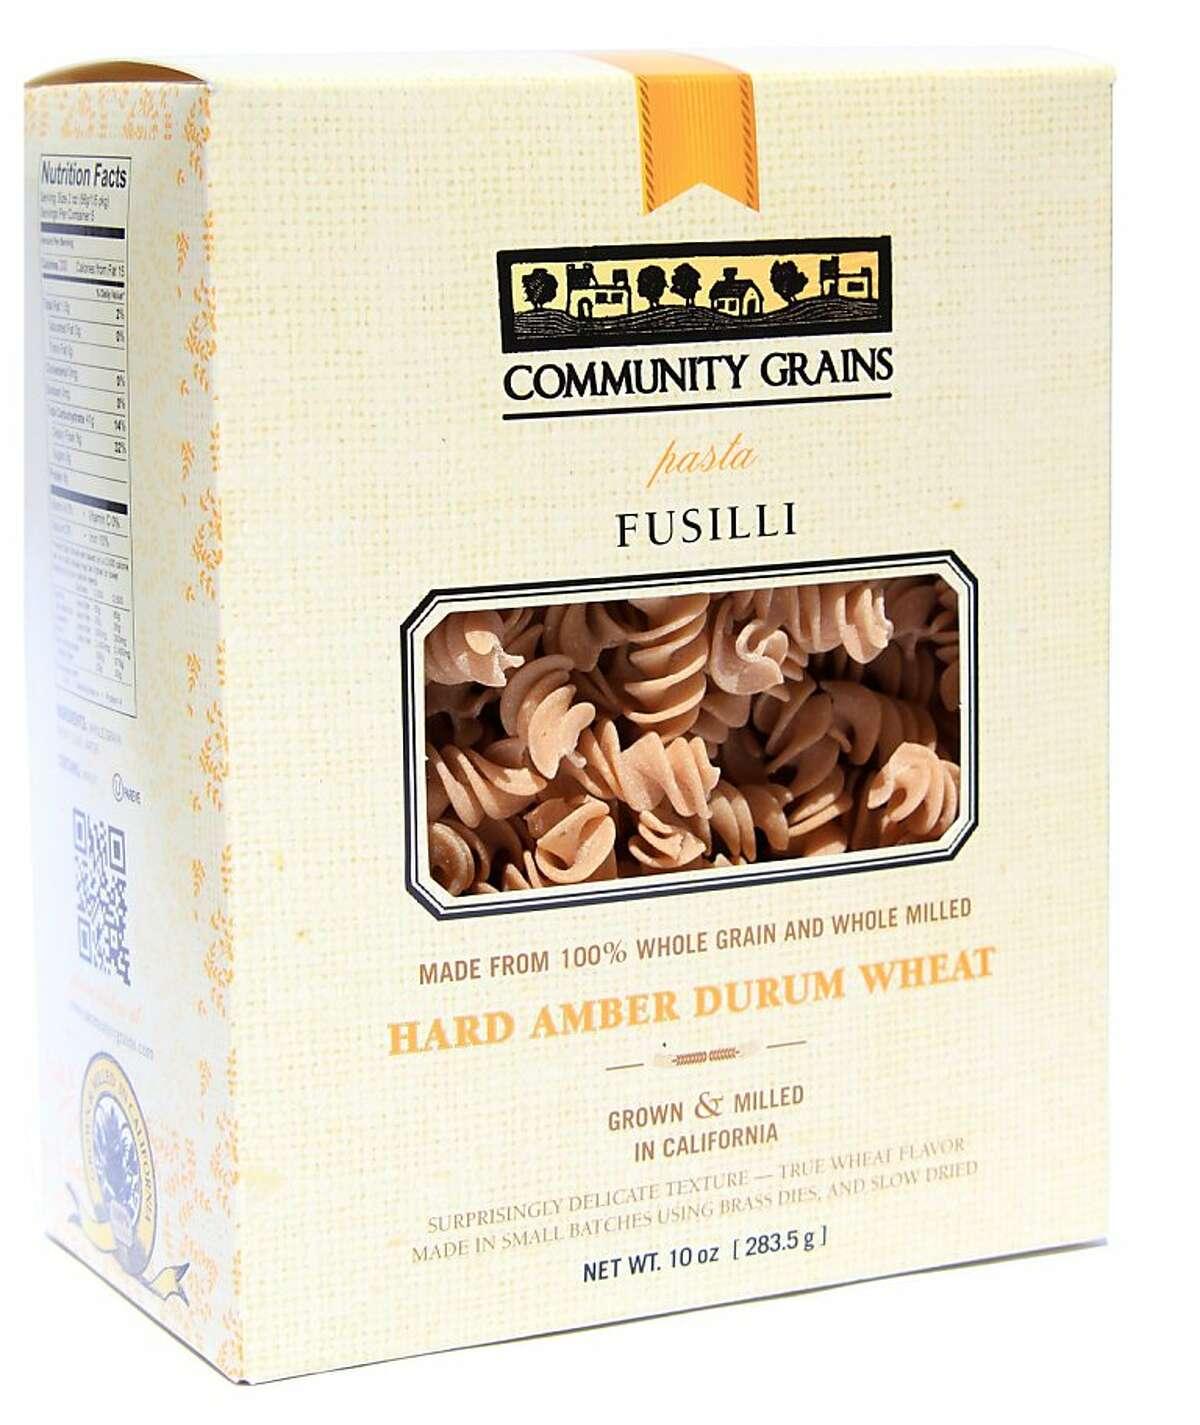 Community Grains whole grain pastas are available as pappardelle, linguine, fusilli and conchigli.